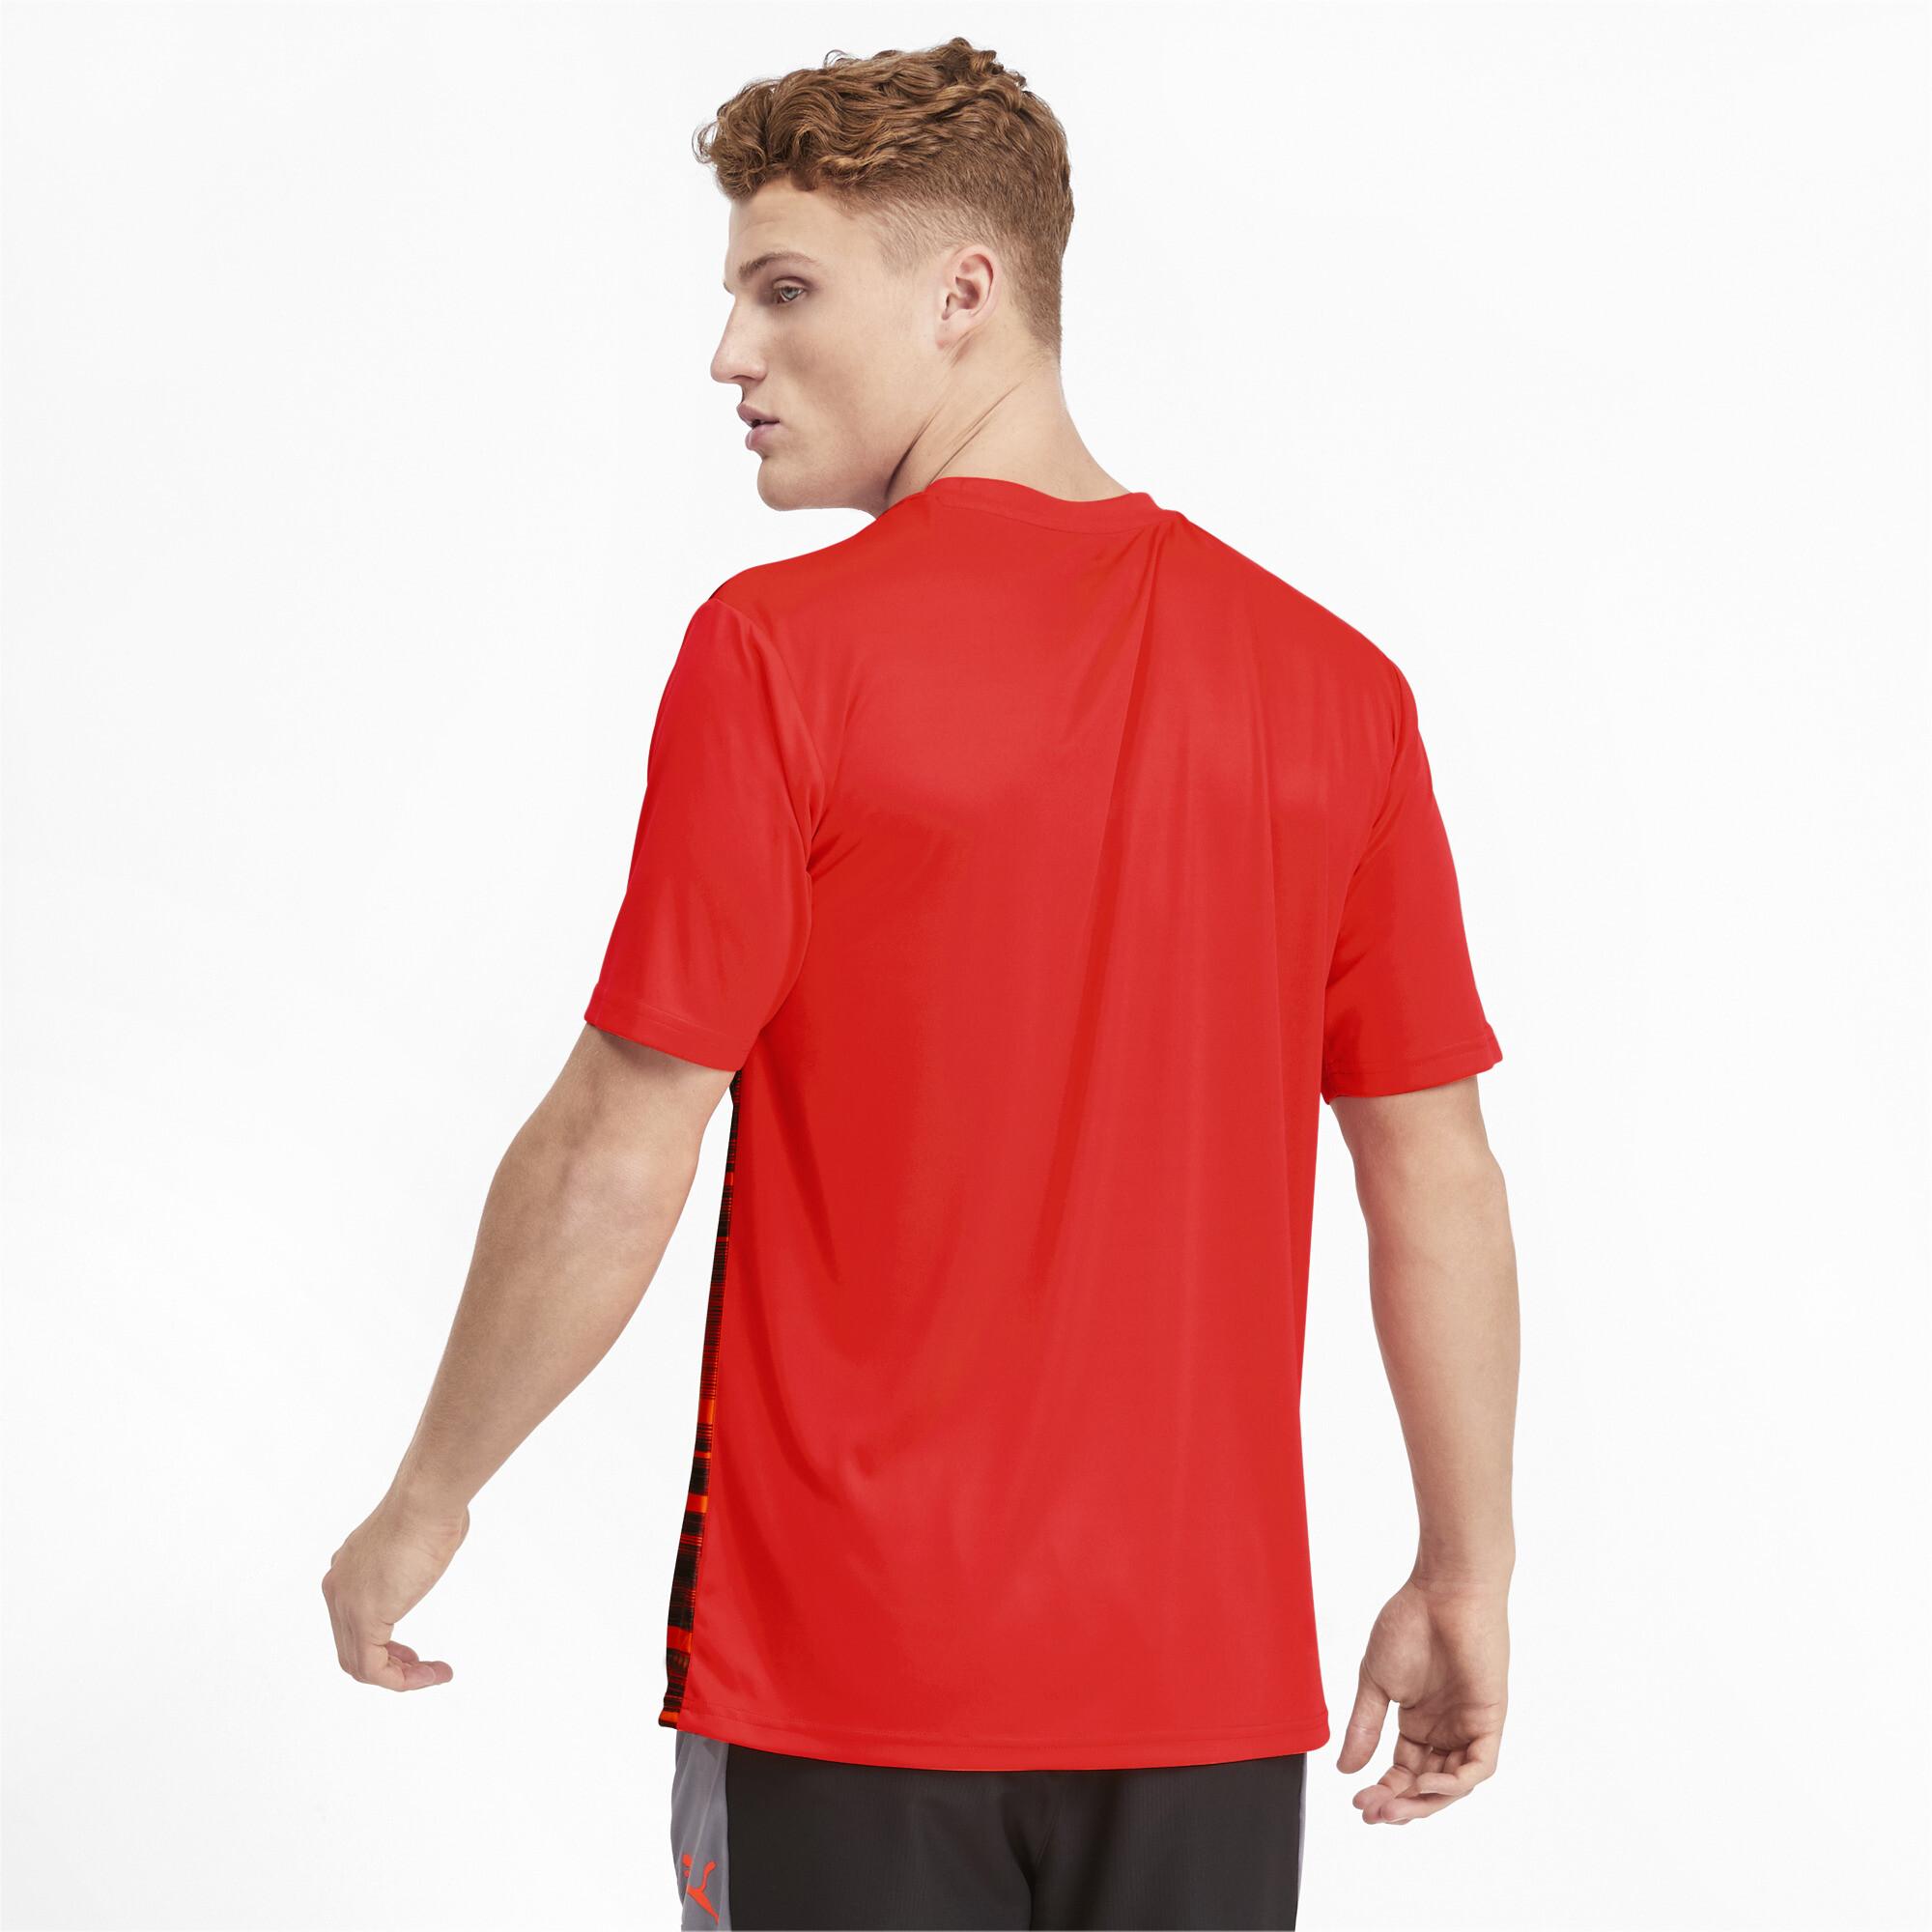 PUMA-ftblNXT-Core-Graphic-Shirt-Men-Tee-Football thumbnail 5